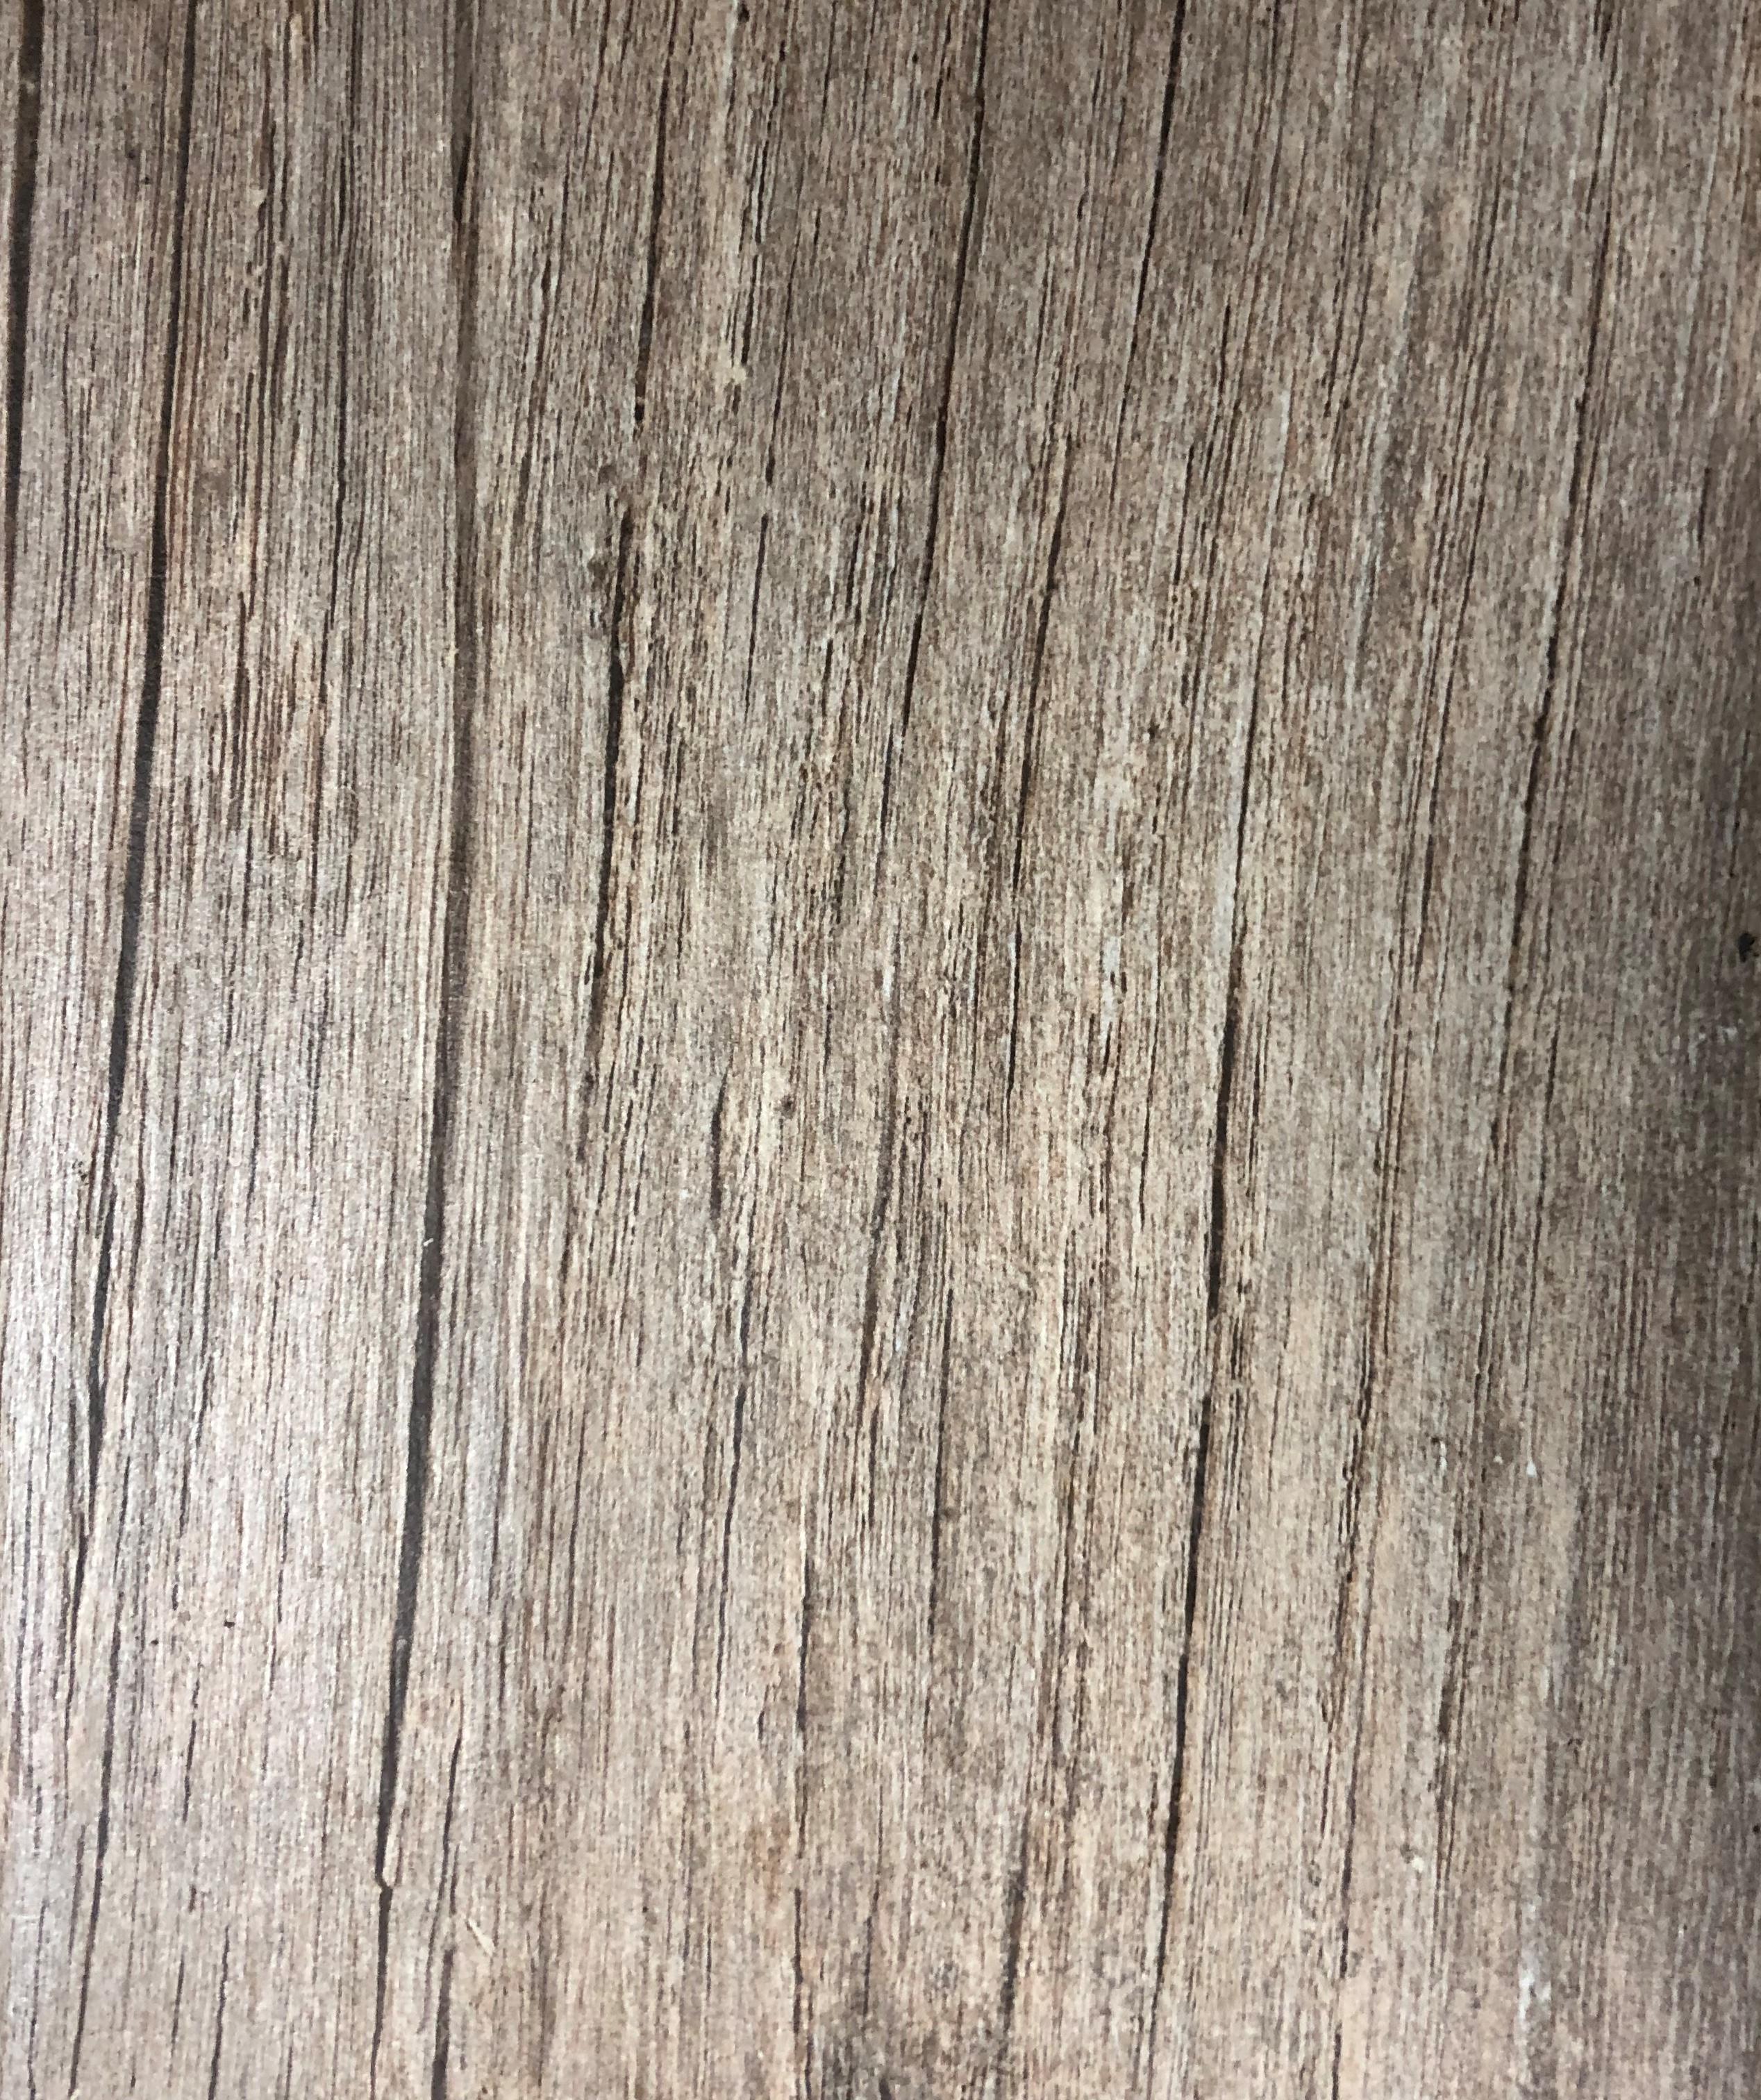 Railwood, Natural | 8